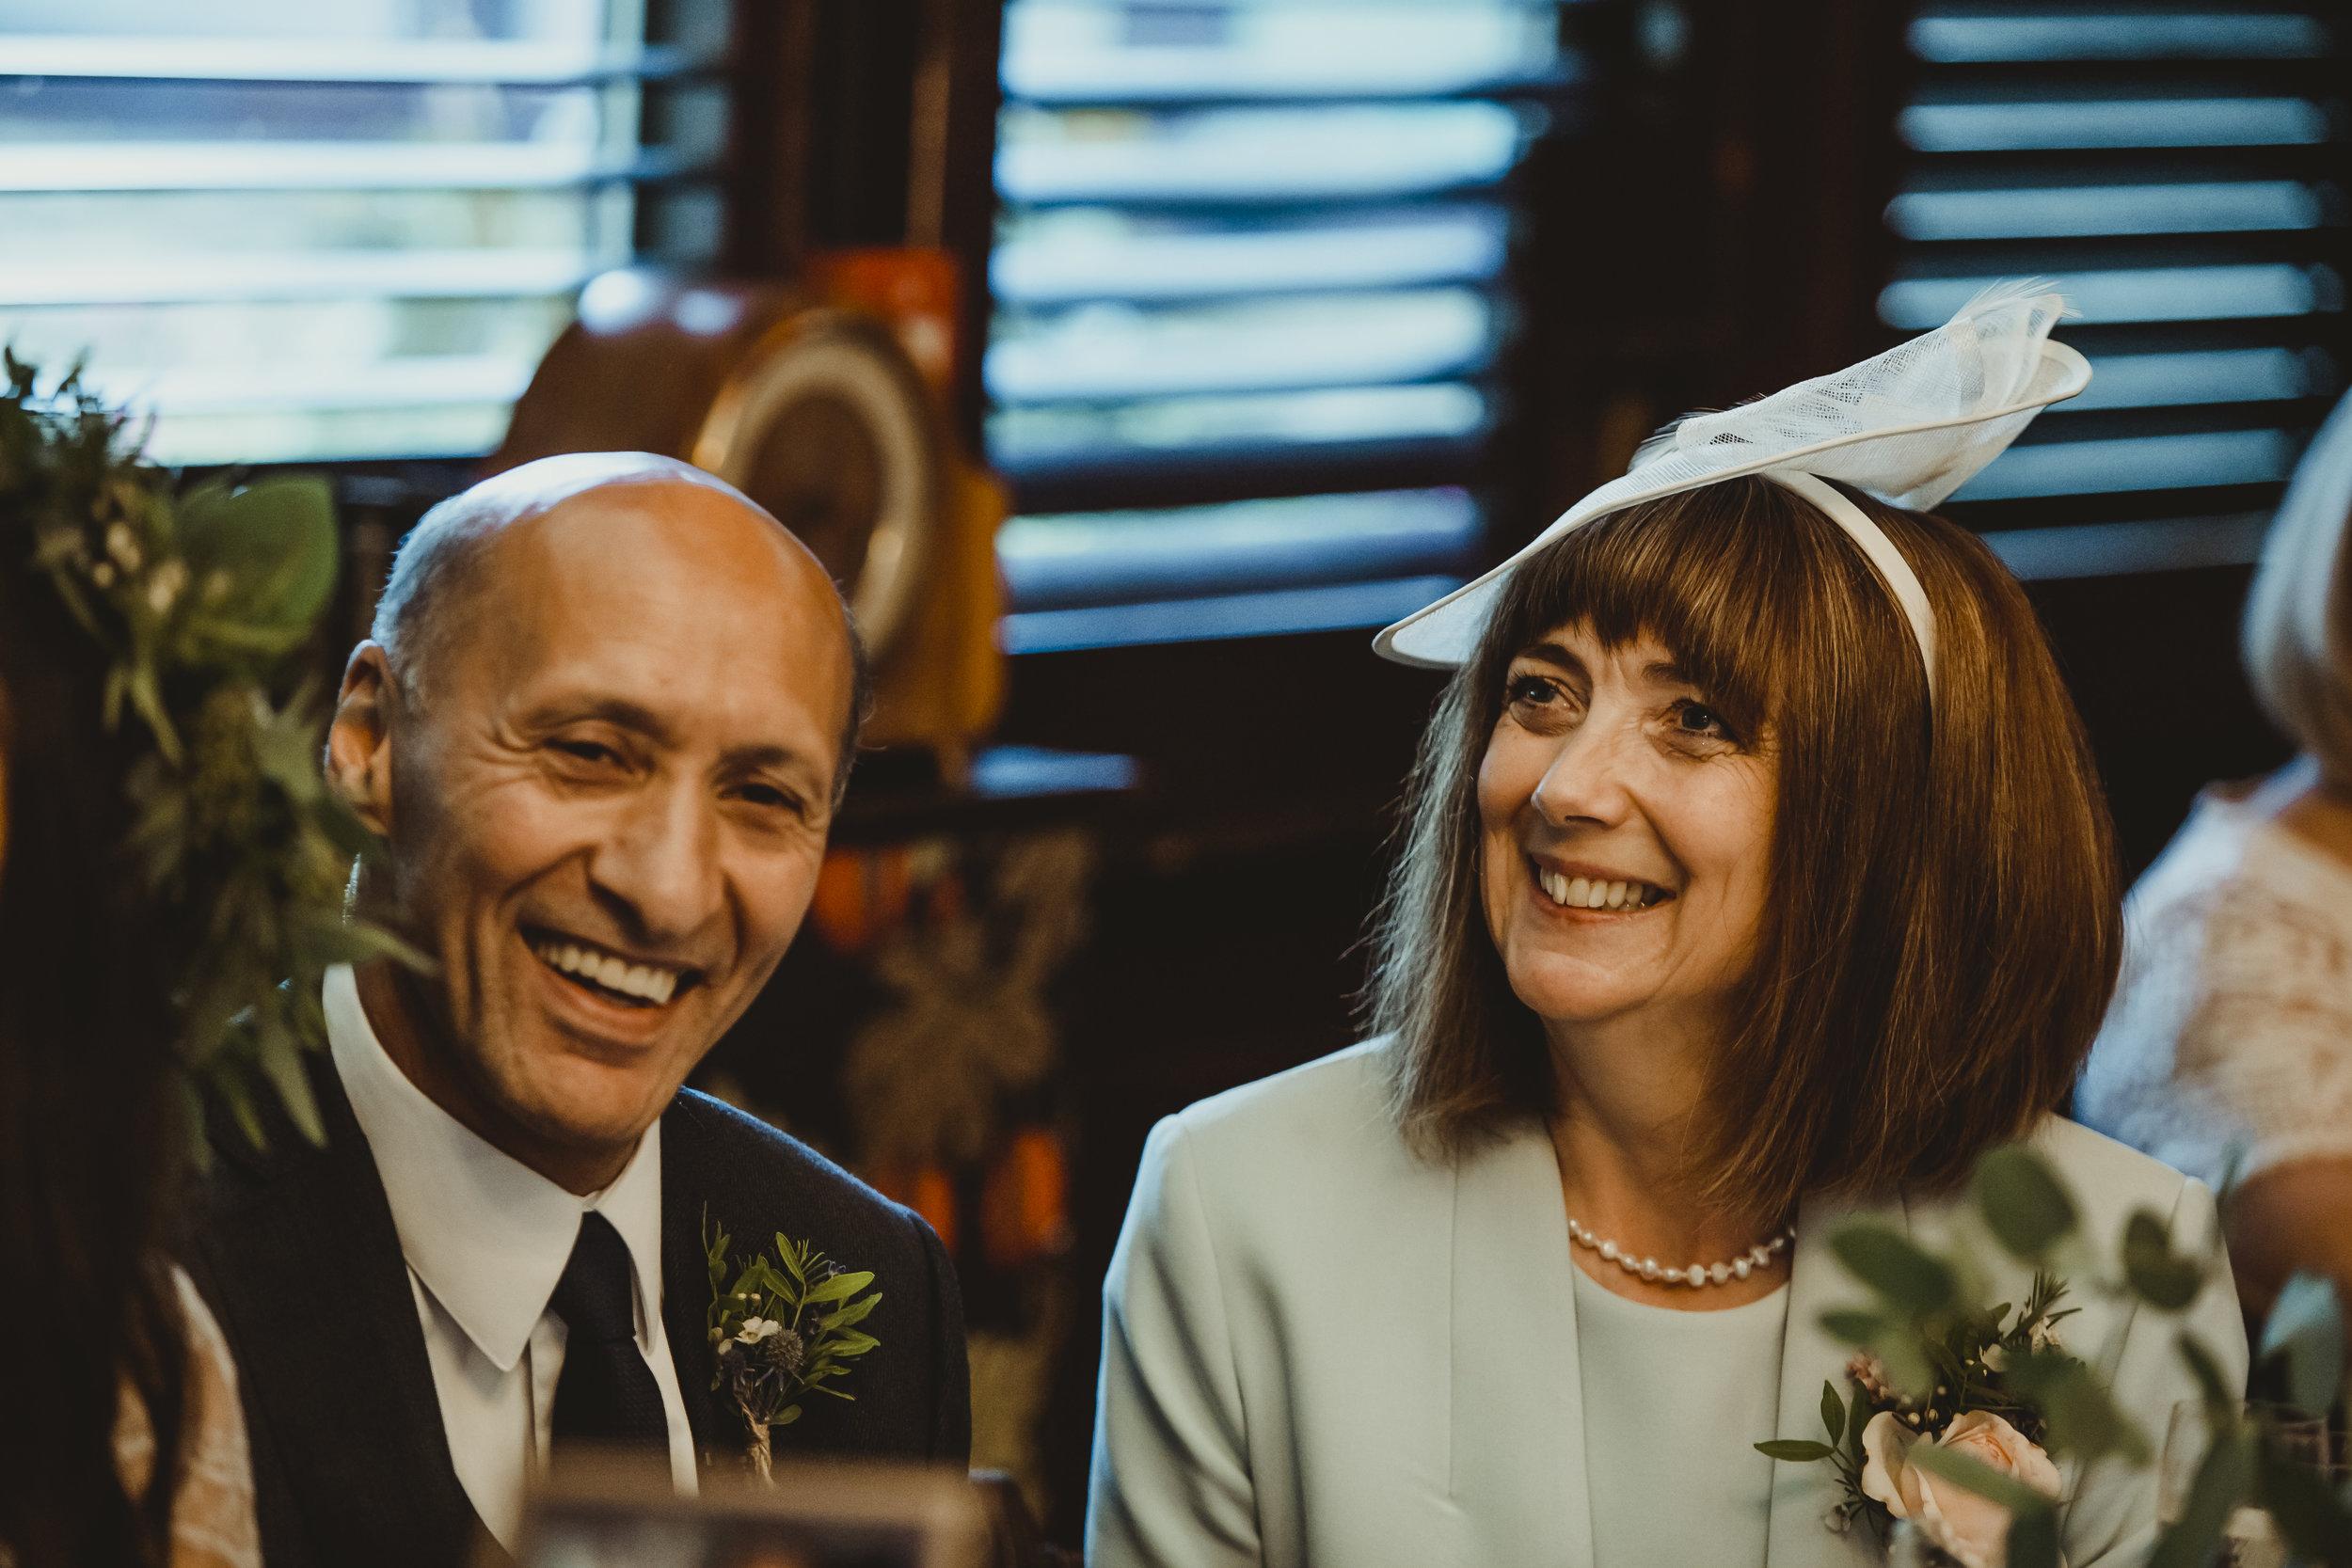 N&J_YORKSHIRE_WEDDING_PHOTOGRAPHER_MALTON_LEEDS_SHEFFIELD-678.JPG